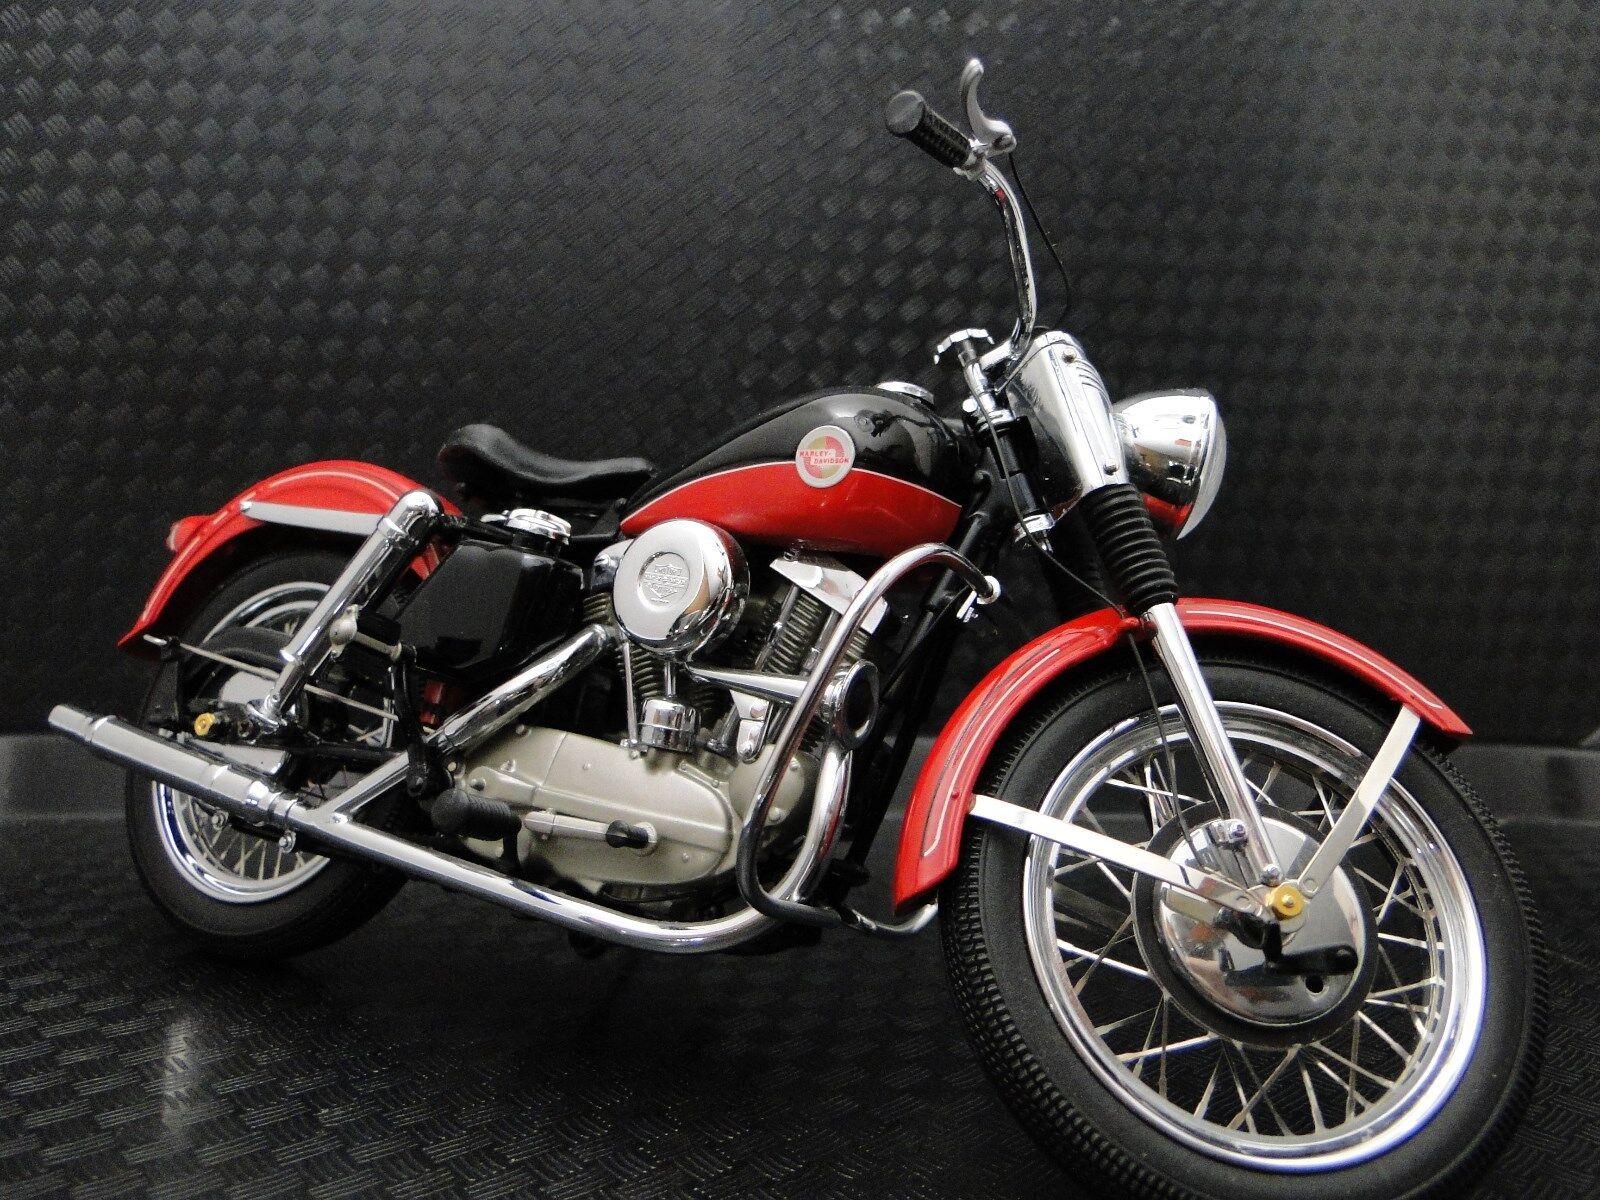 1950 -talet Harley Davidson Motorcycle modelllllerlerl Easy Rod Egen Rider Touring cykel 1 10